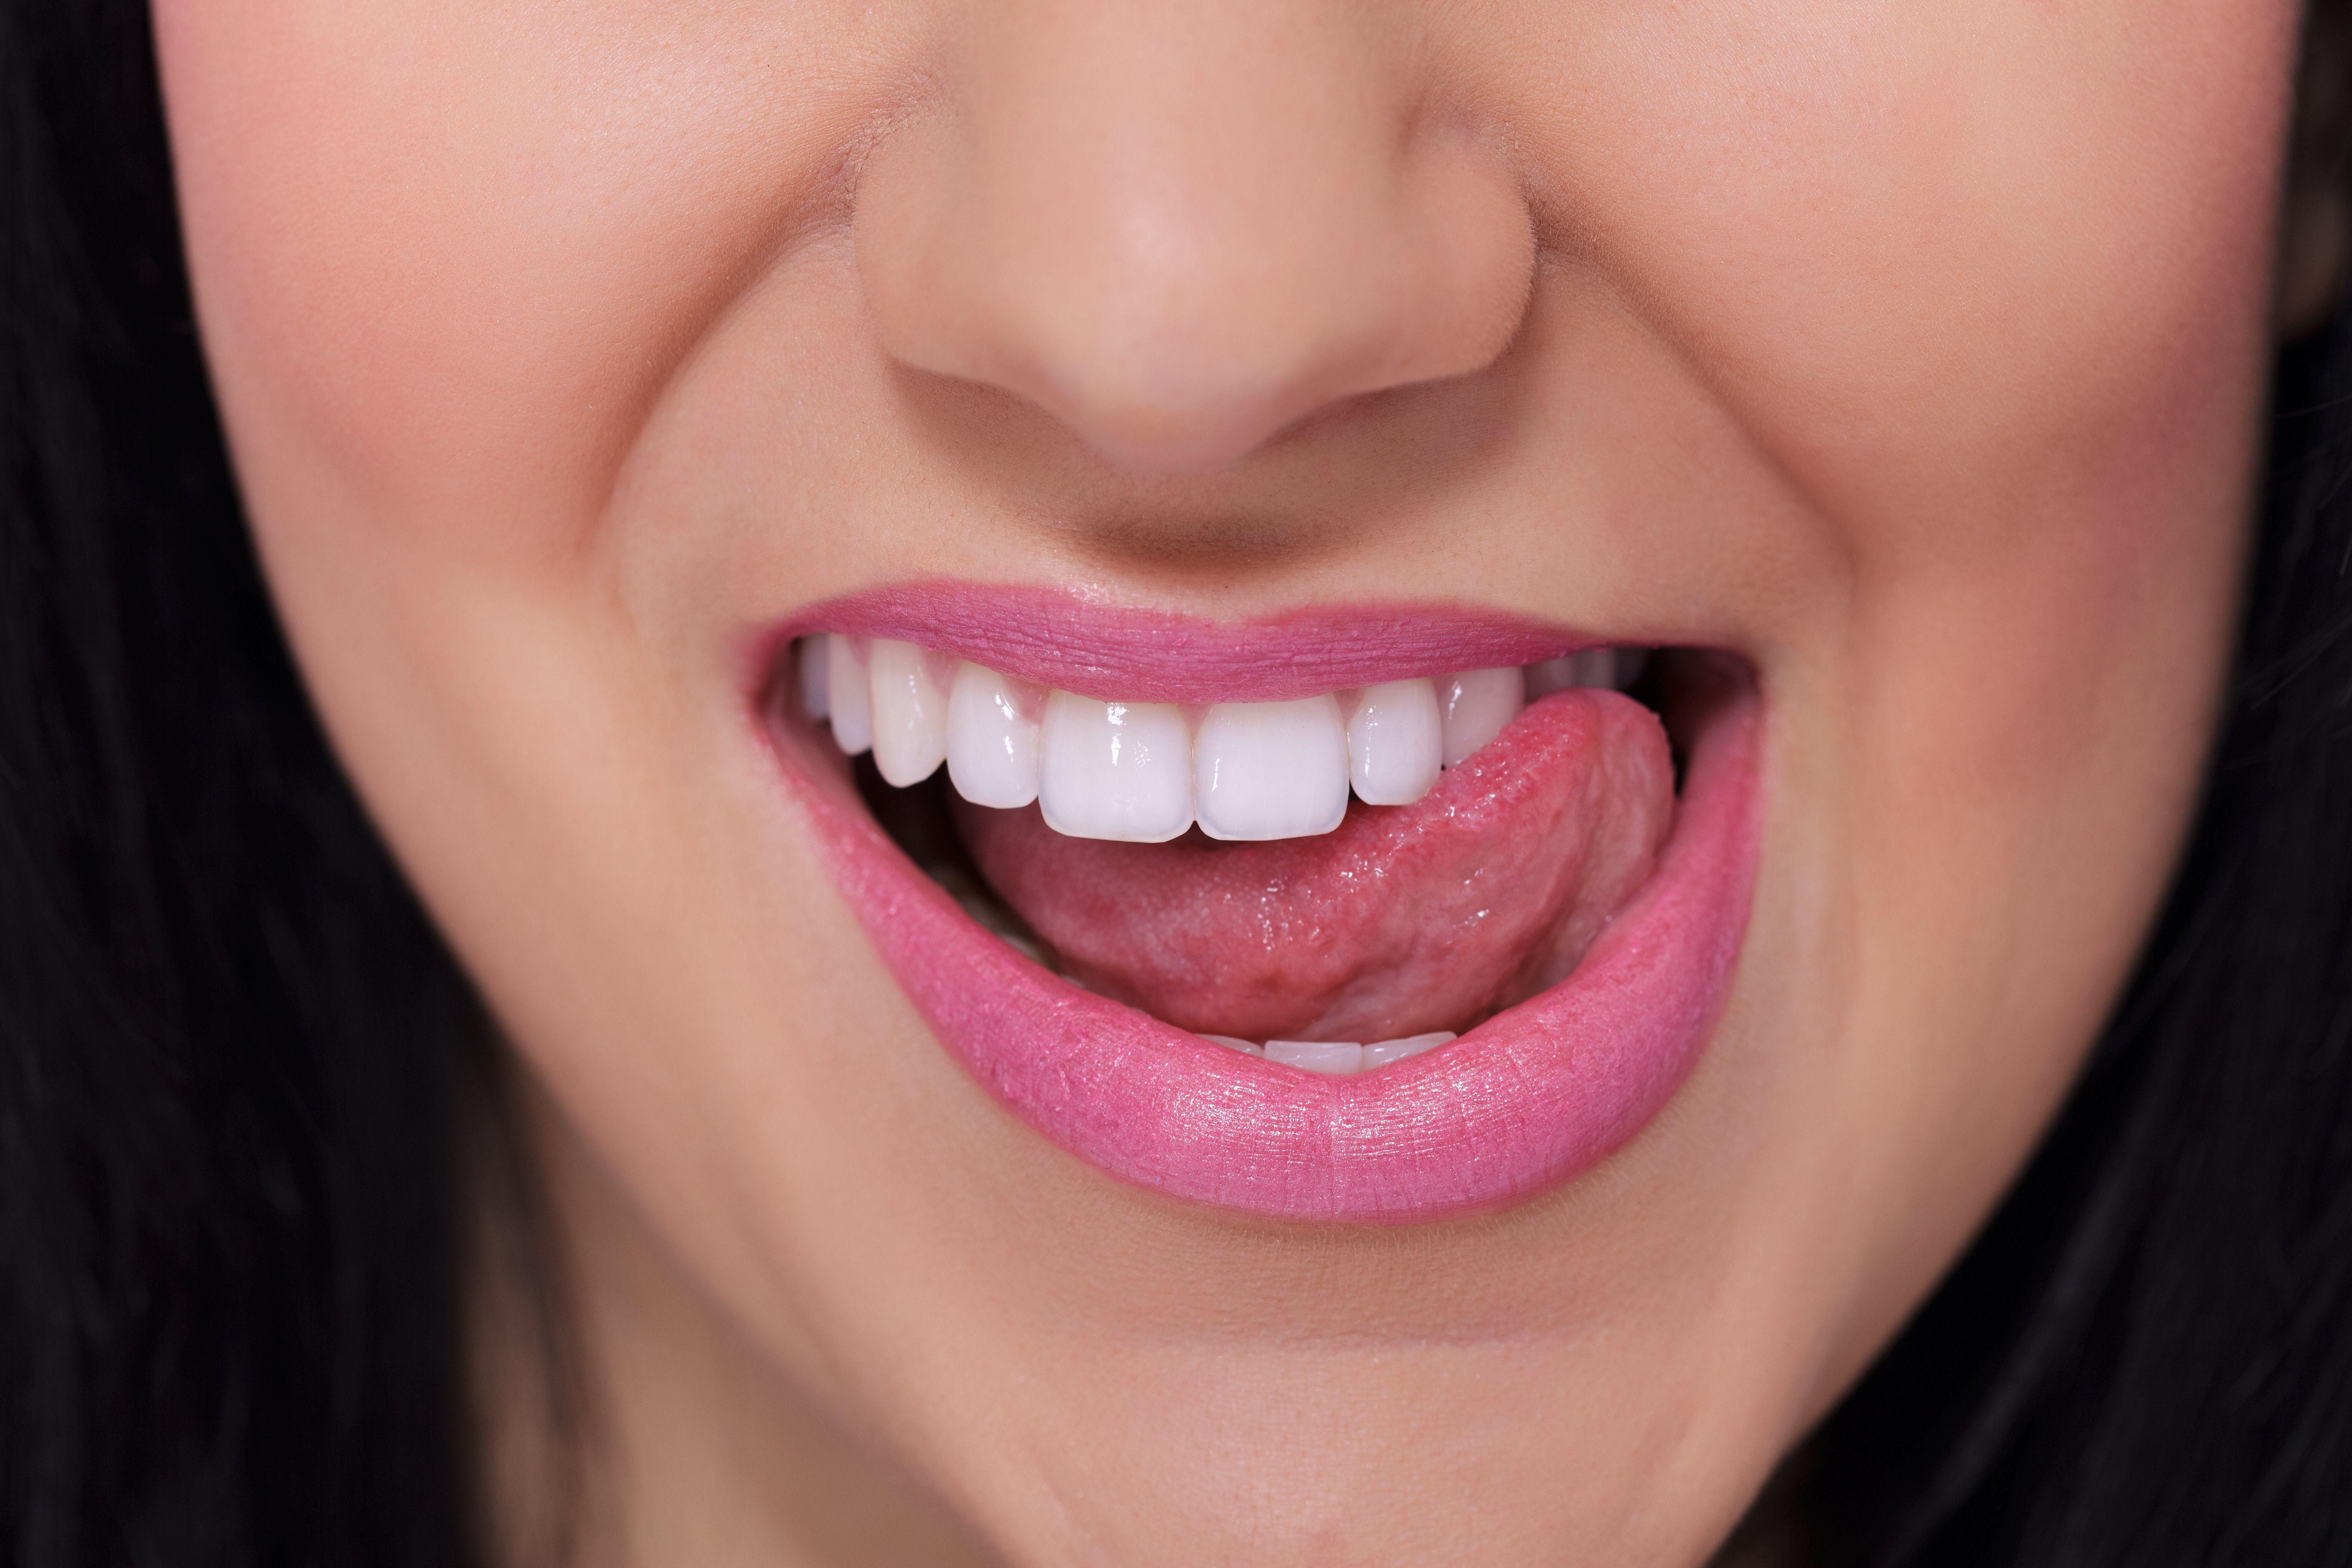 Sperm design tongue ring